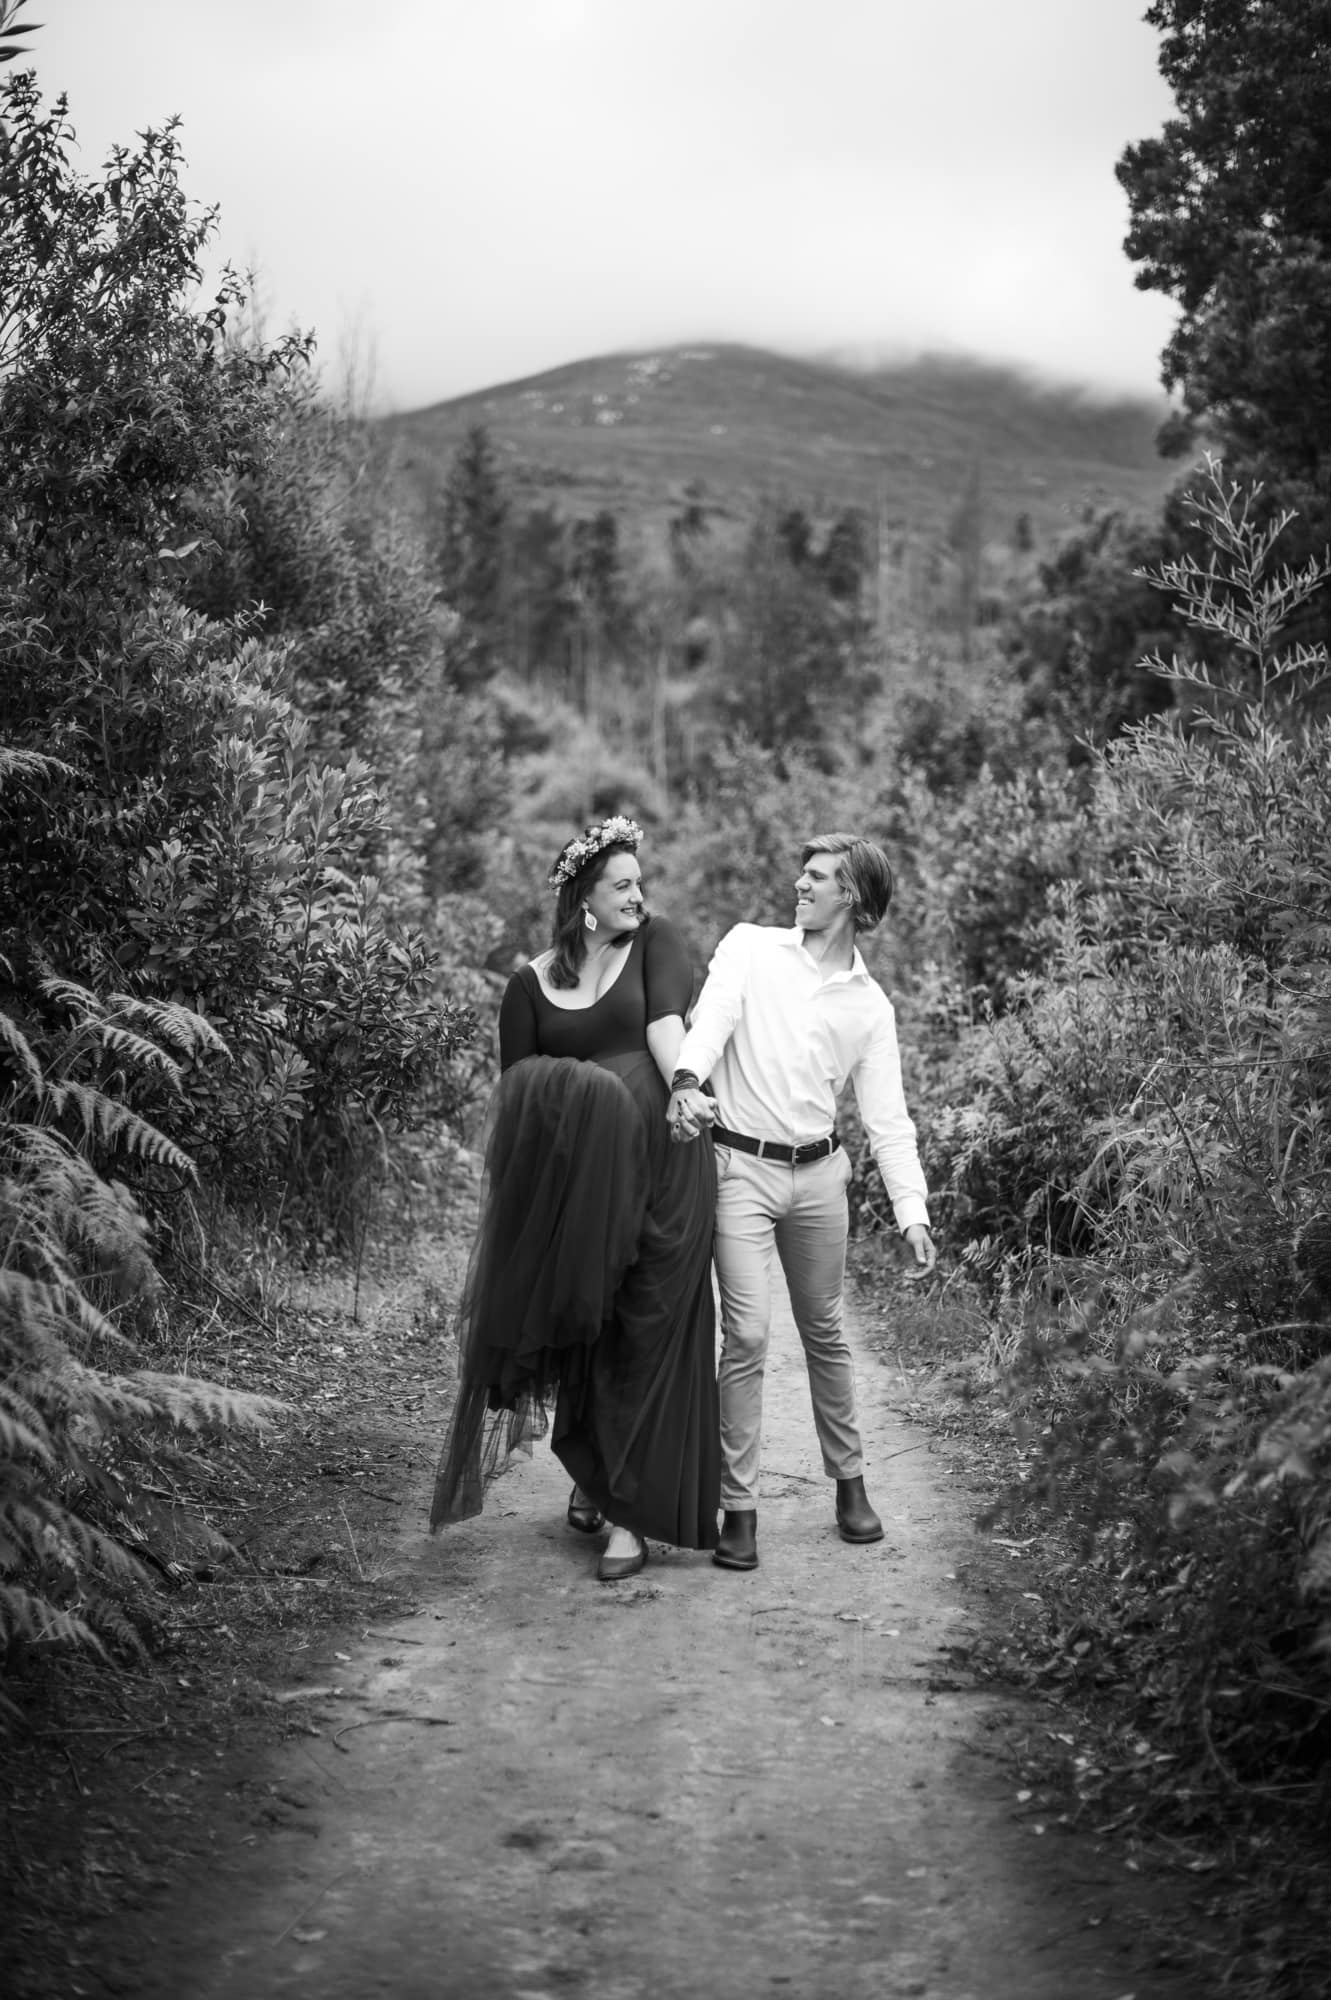 wesley-lanie-george-fernridge-engagement-June-Richards-Photography-Destination-Weddings-Elopements-Garden-Route-21